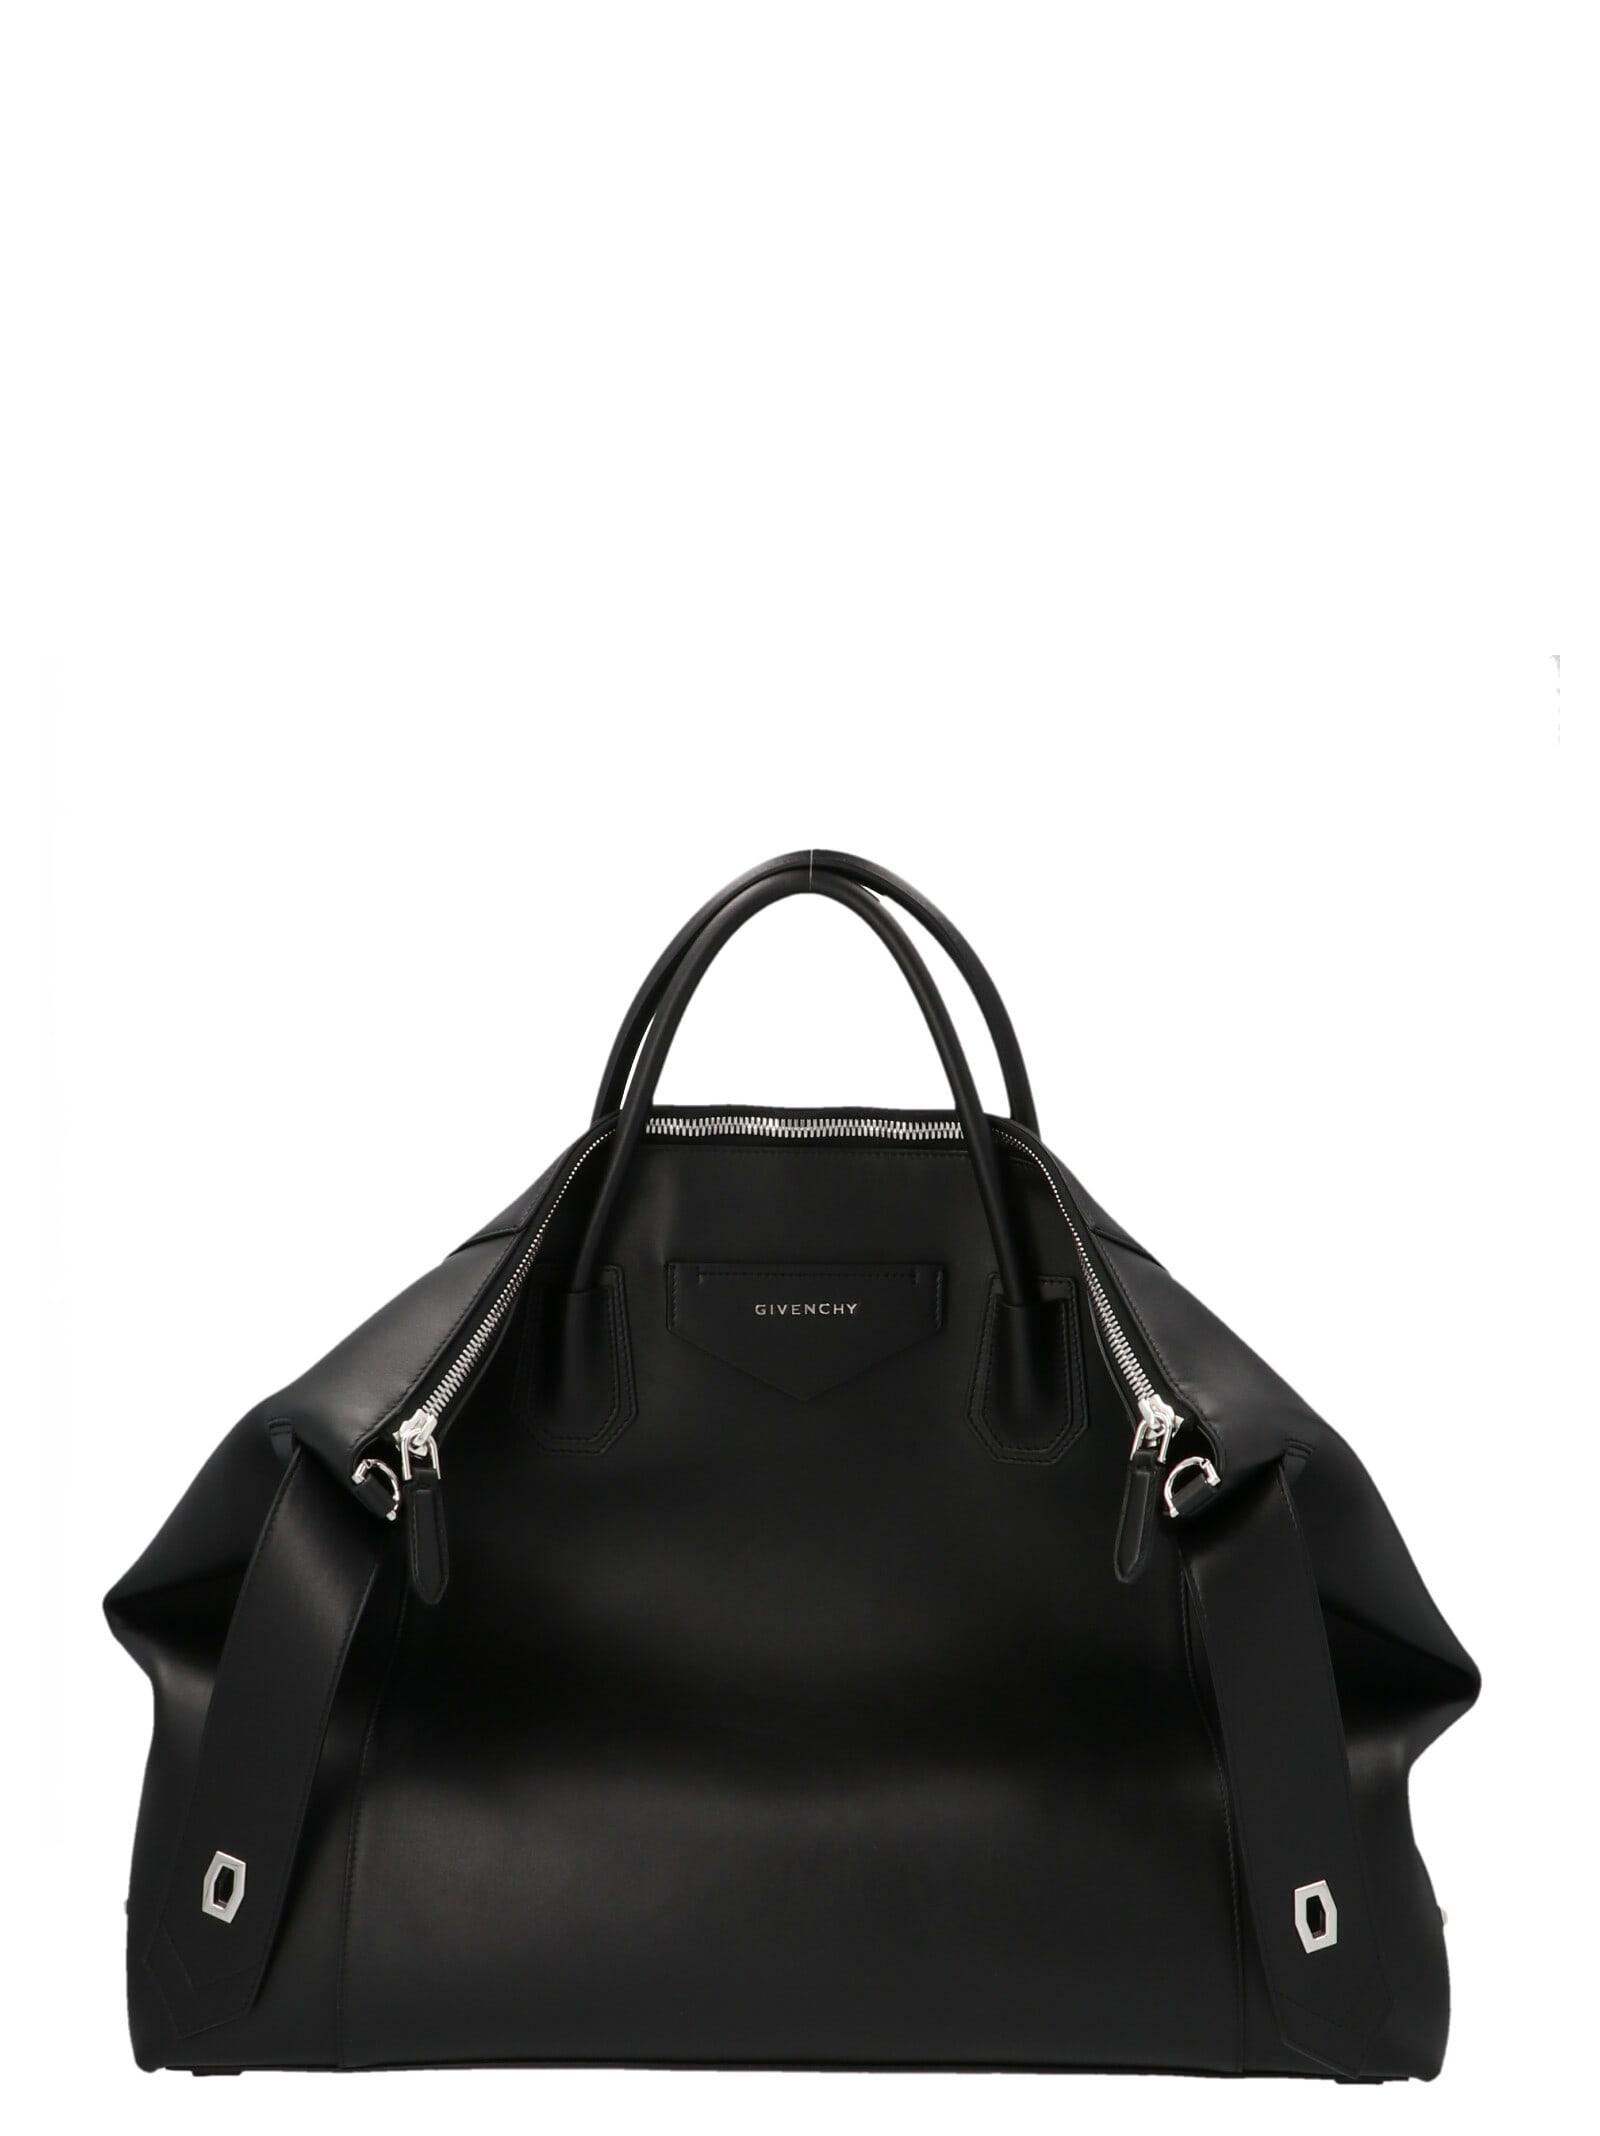 Givenchy antigona Soft Large Bag